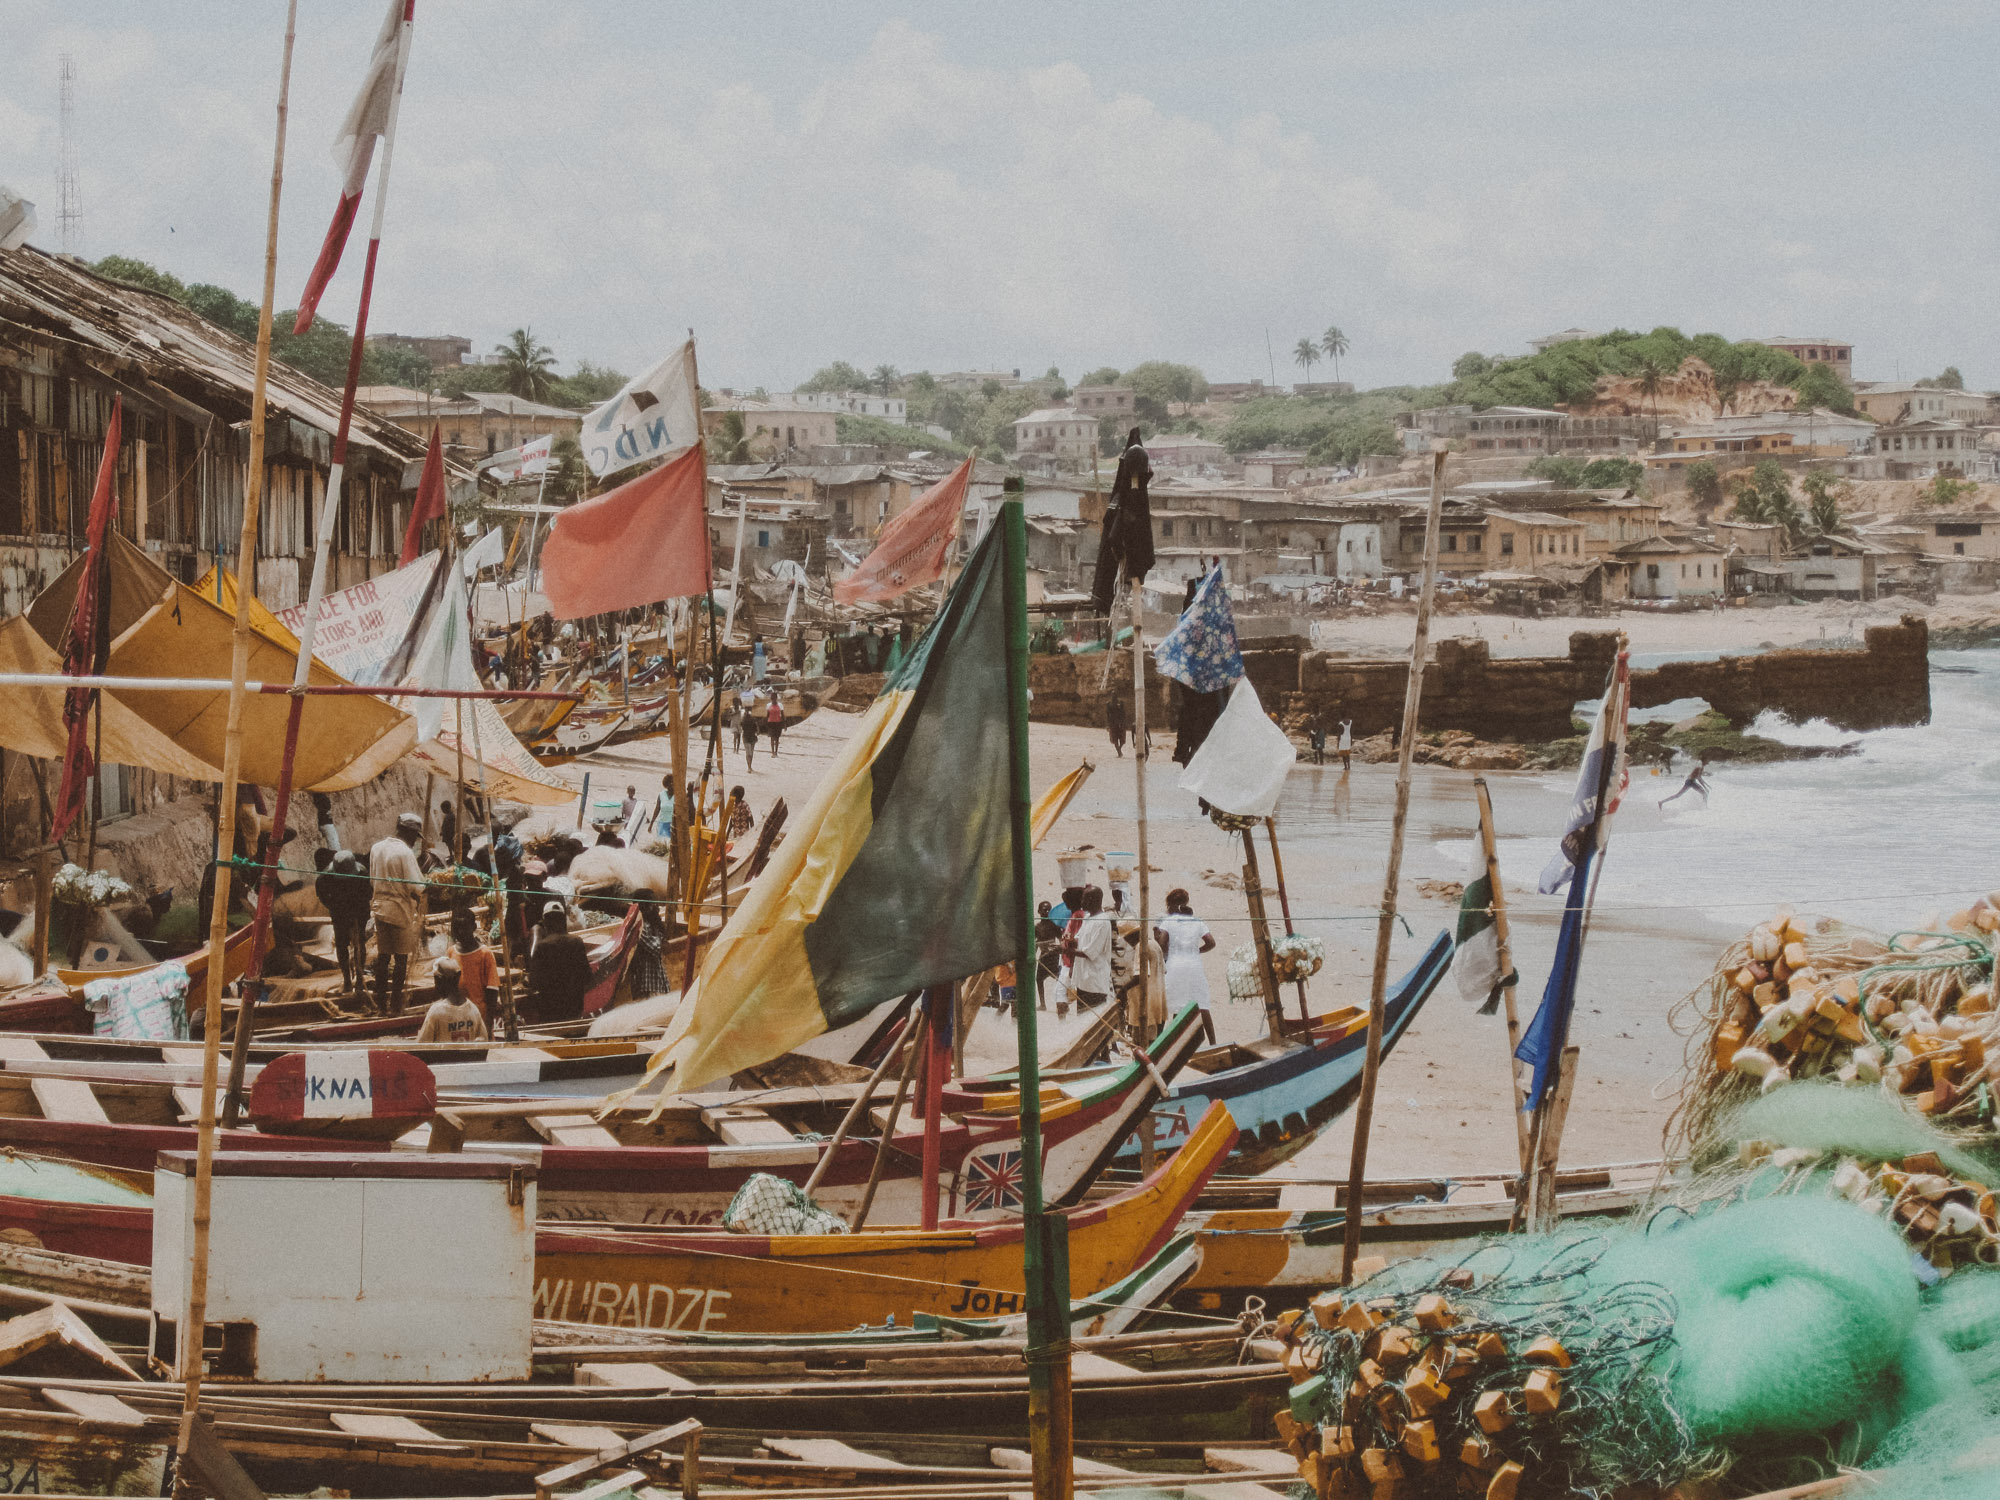 Fishing boats in Cape Coast, Ghana | Photo by Caroline Taft,  The Brazen Gourmand